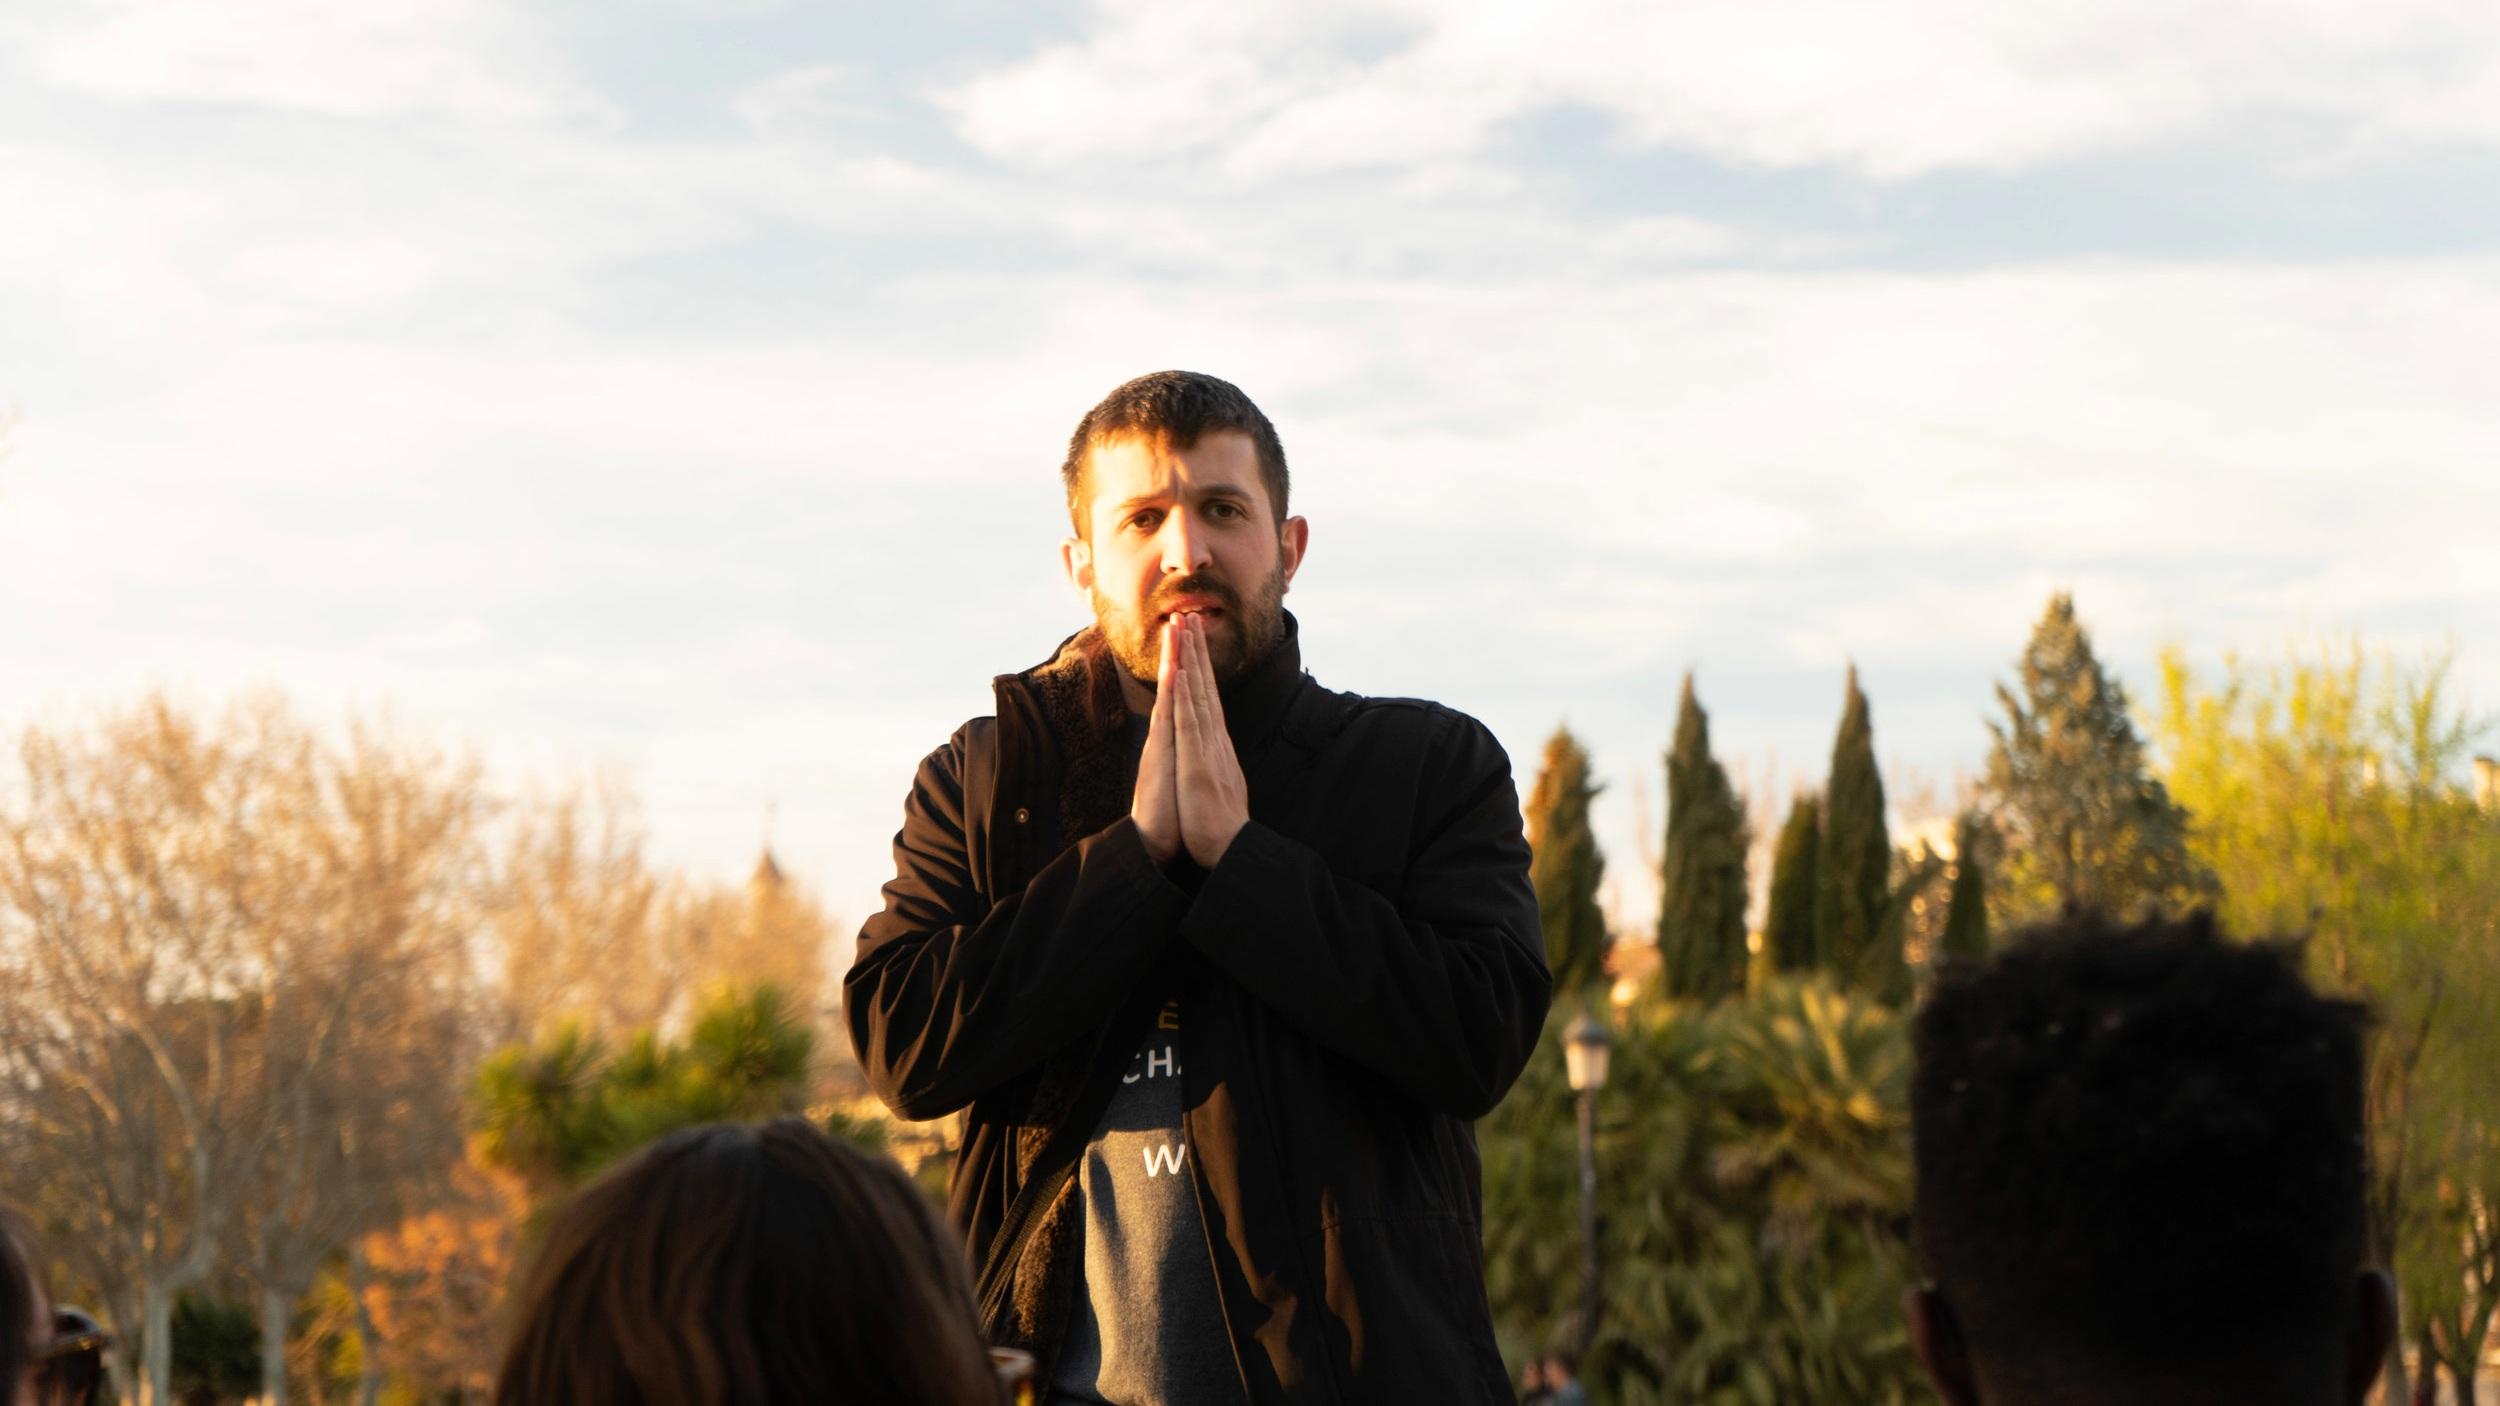 Author Joe Meringolo, Director of Program Development, leads a group reflection in Madrid's Parque Oeste (West Park).